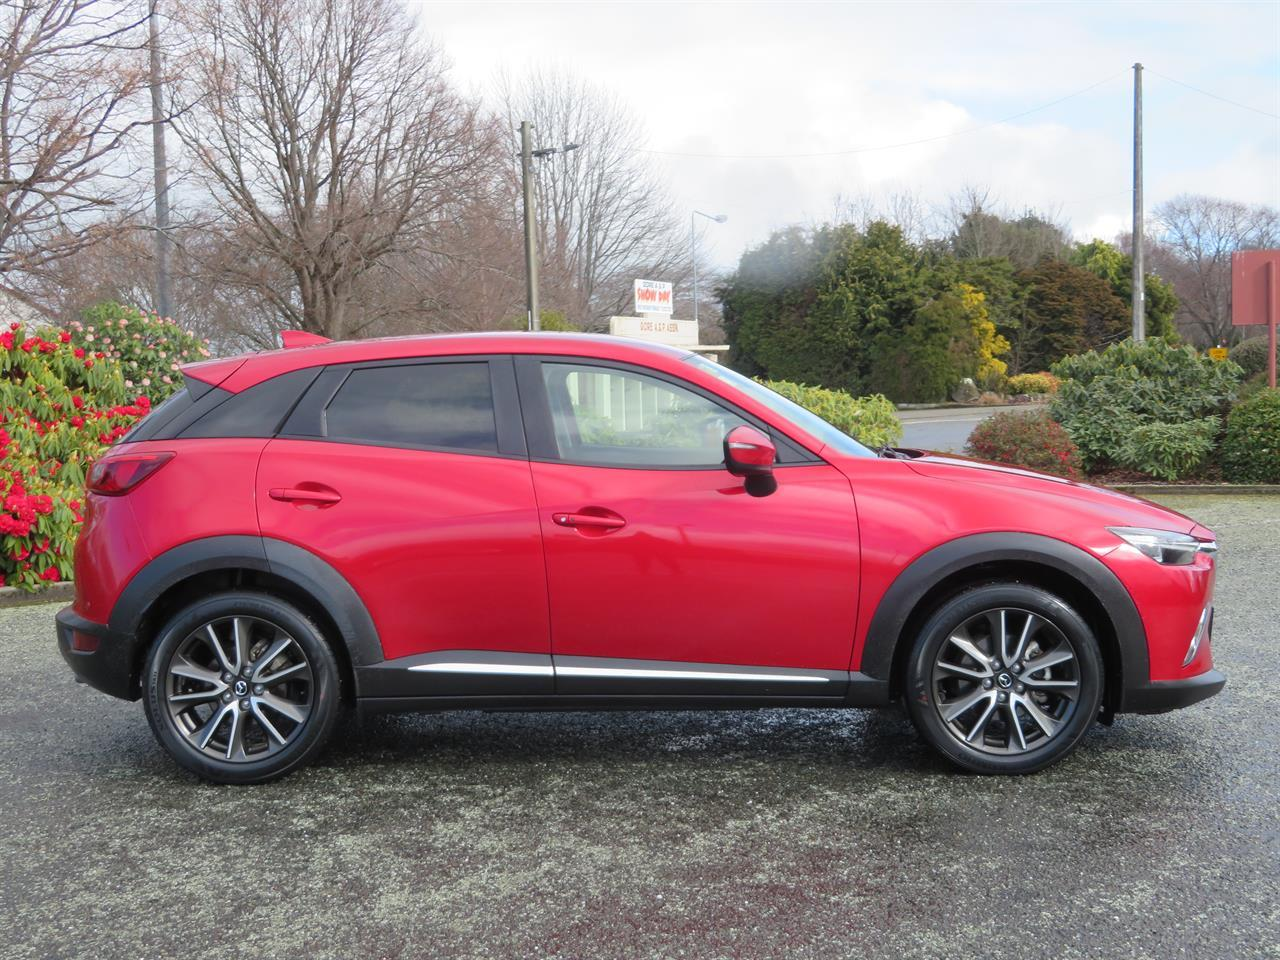 image-2, 2015 Mazda CX-3 LTD AWD at Gore